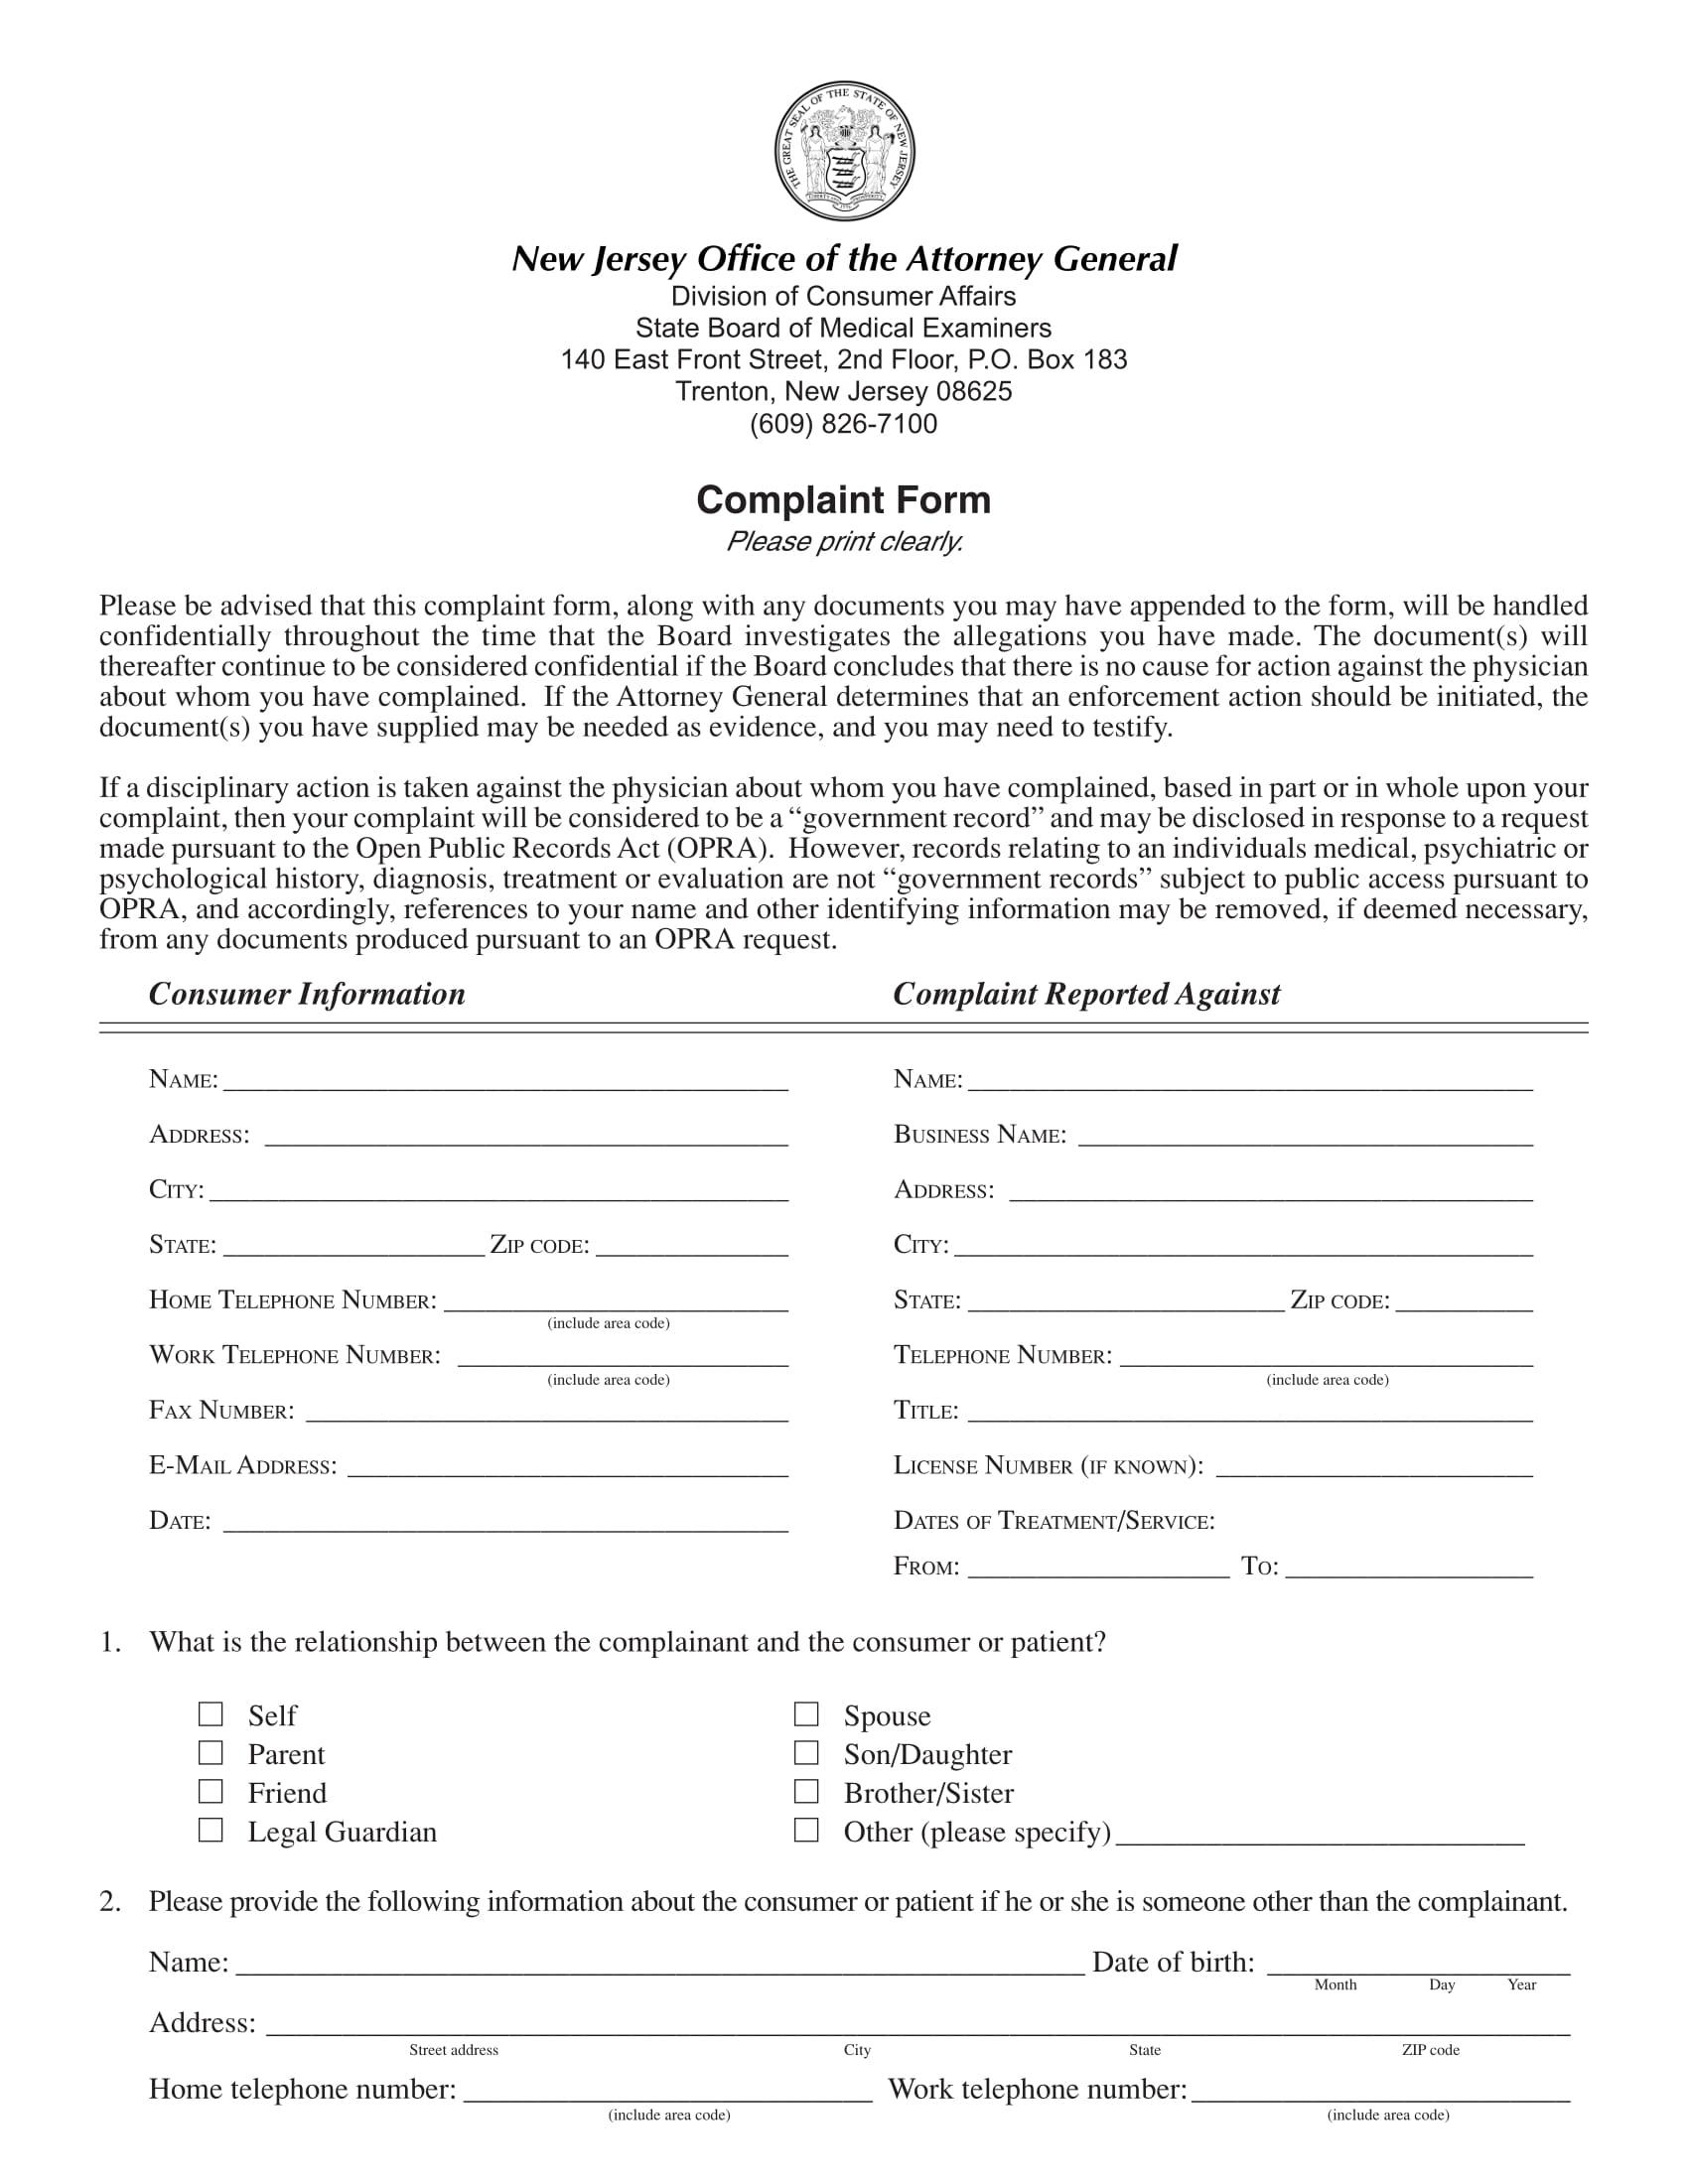 medical exam complaint form 2